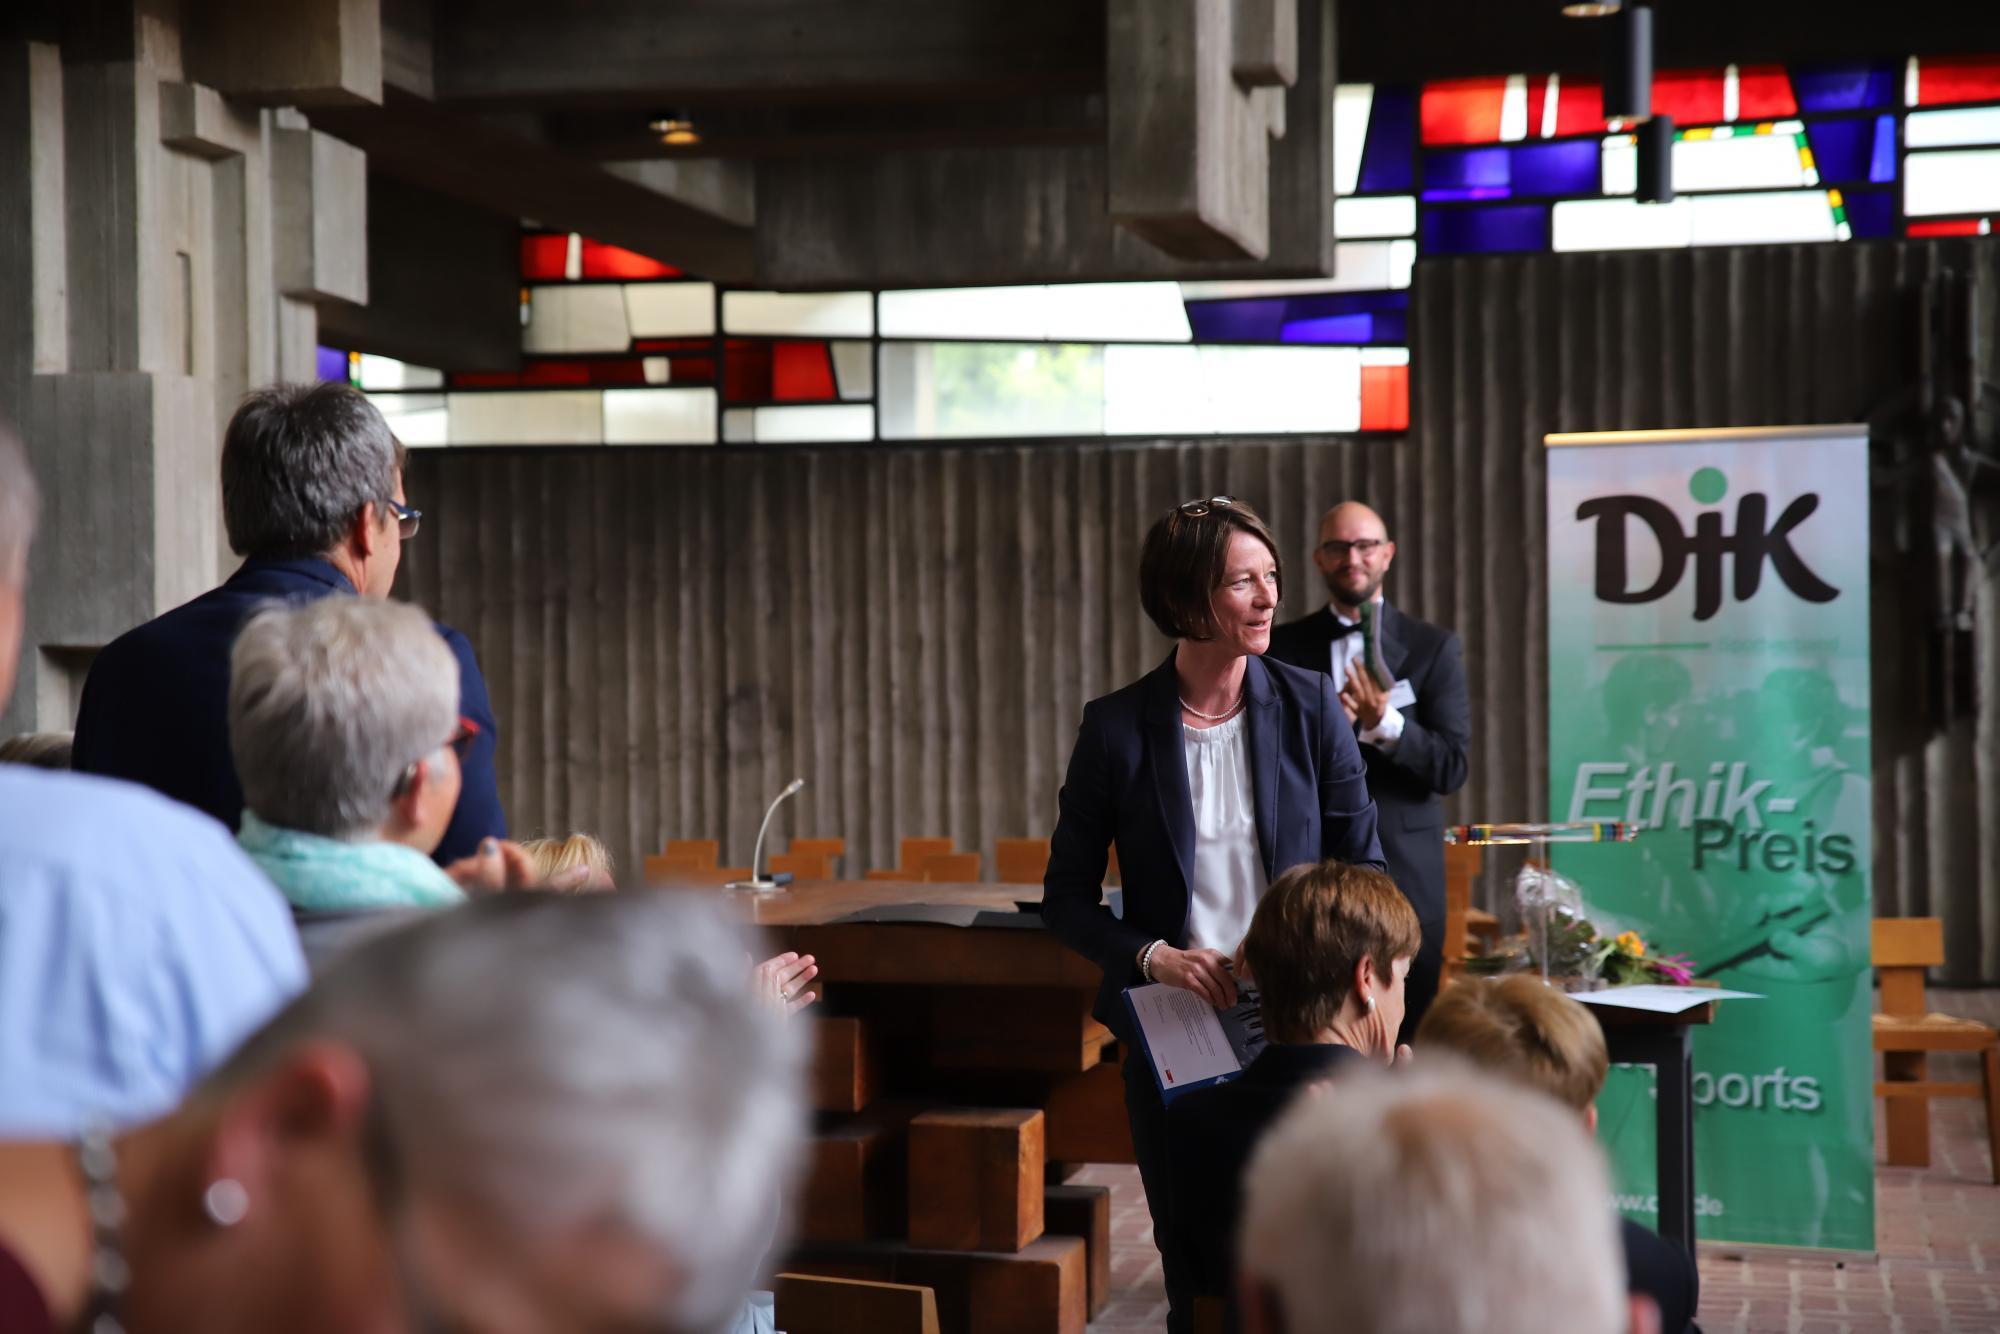 DJK-Ethik-Preis_des_Sports_2019